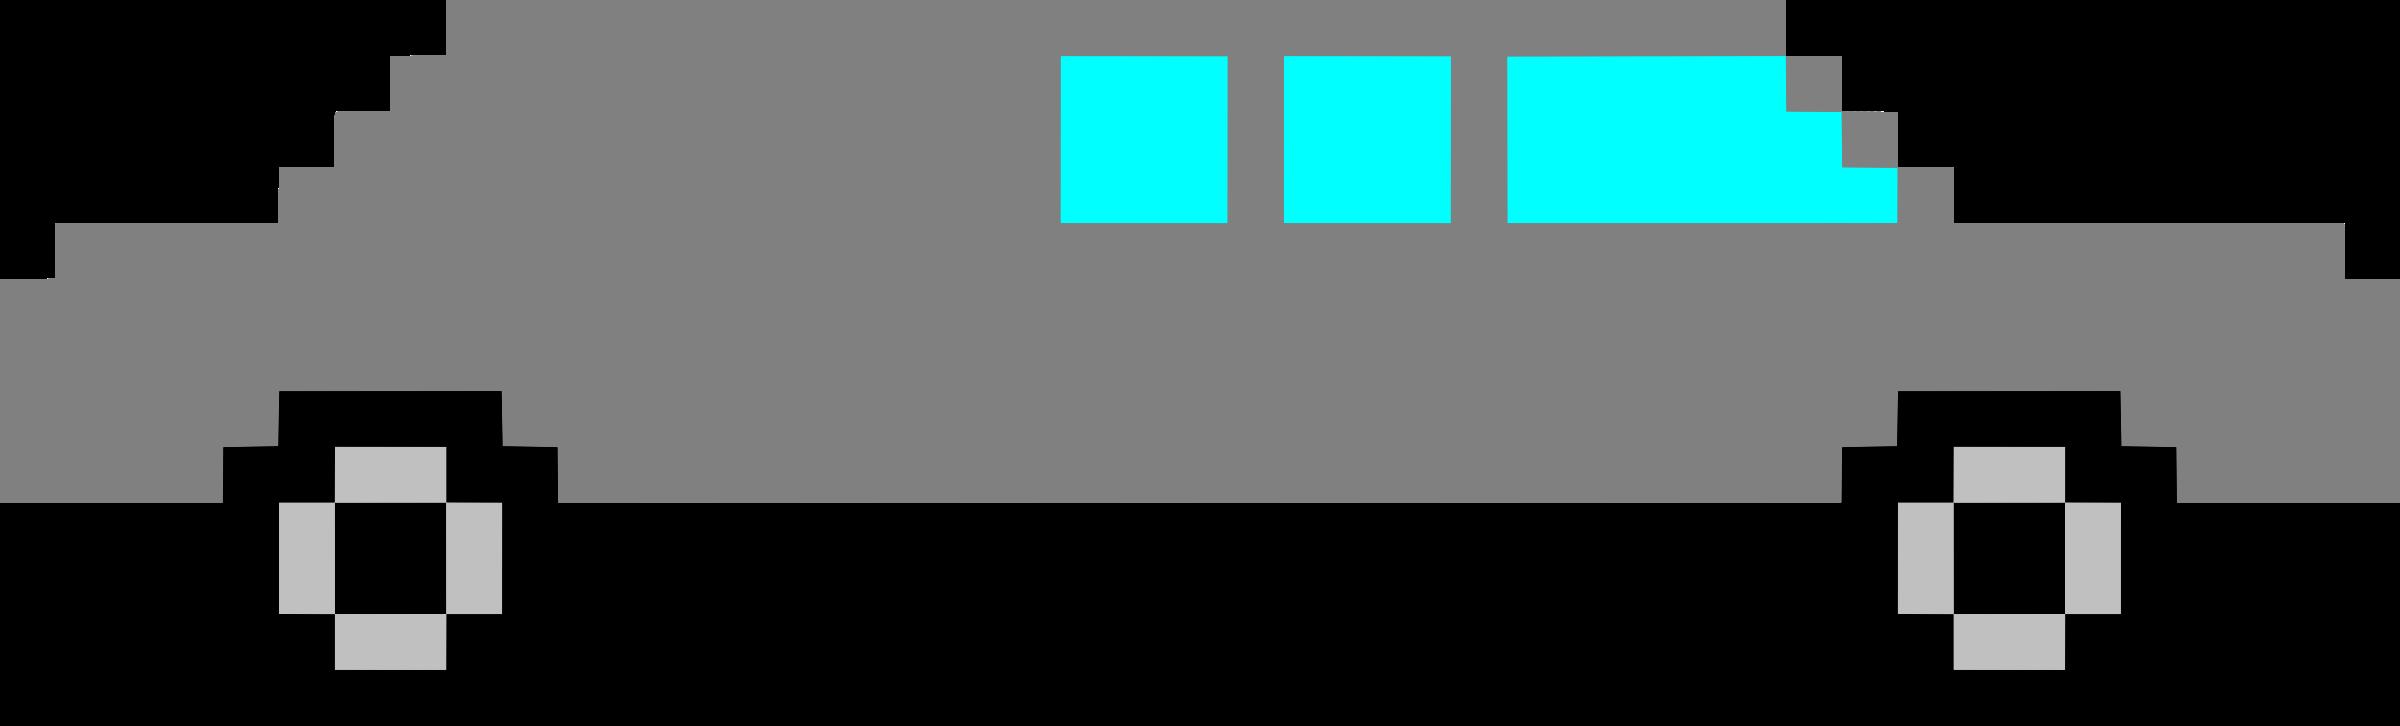 Limousine icons png free. Hexagon clipart pixel art